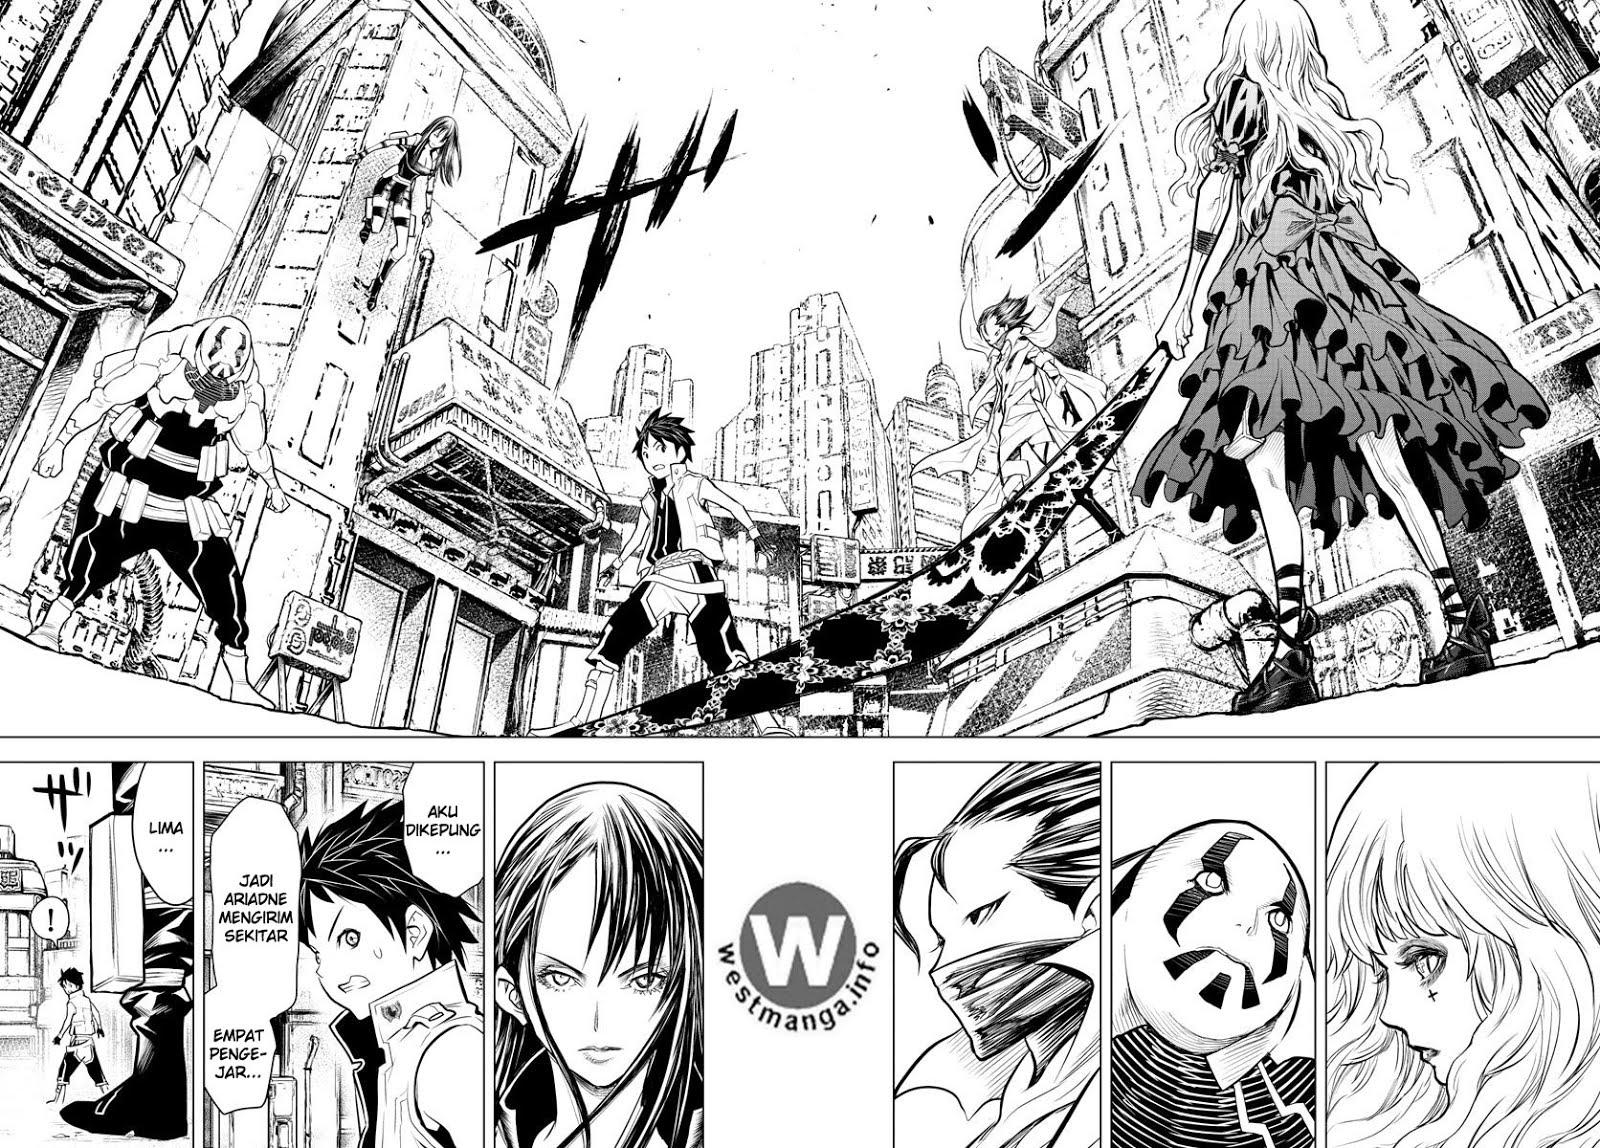 Komik soukyuu no ariadne 007 - chapter 7 8 Indonesia soukyuu no ariadne 007 - chapter 7 Terbaru 14 Baca Manga Komik Indonesia